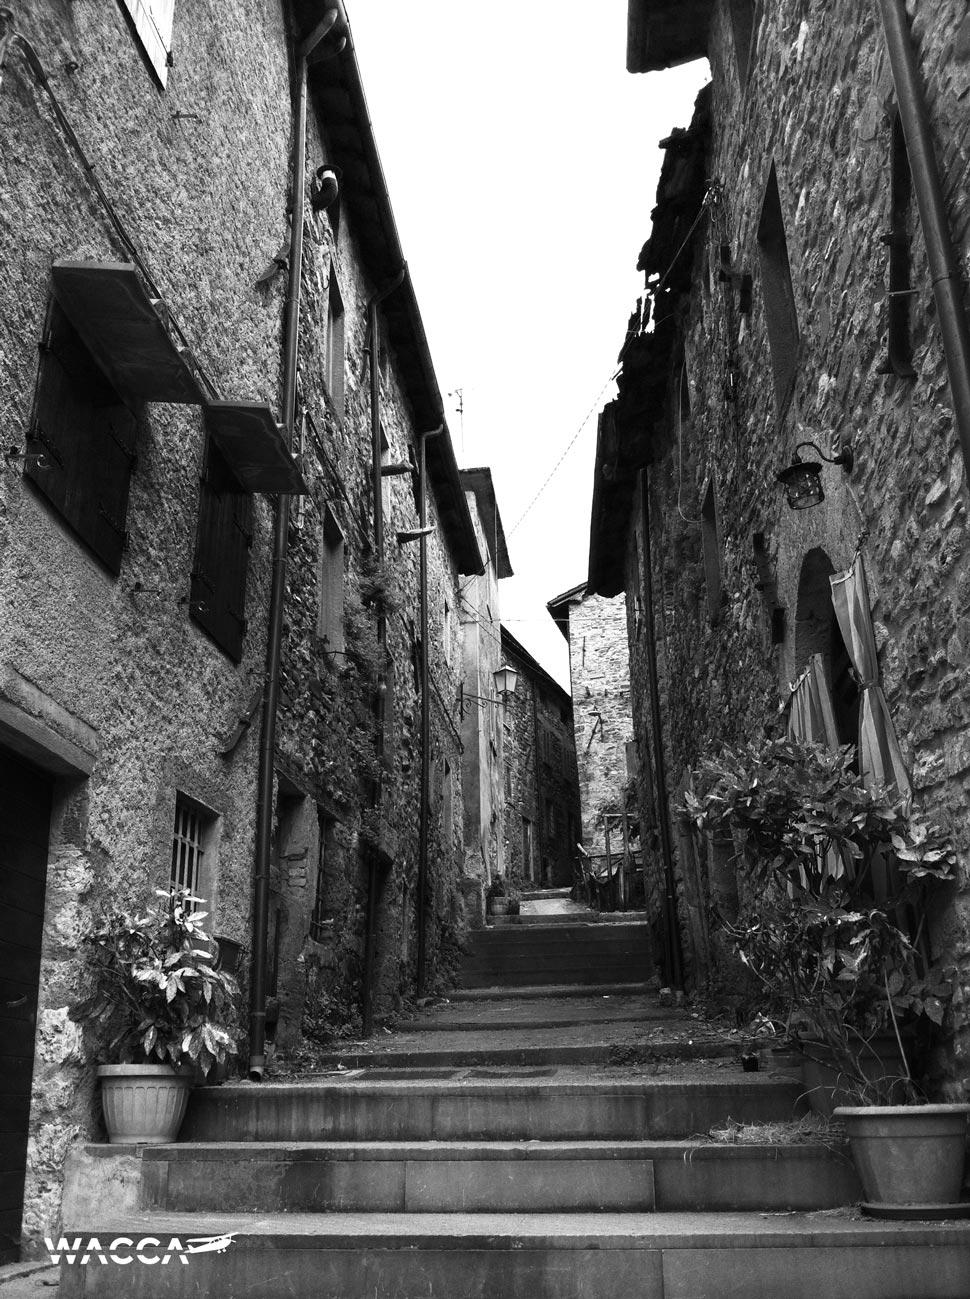 toscane-lagoroadtrip-wacca-06